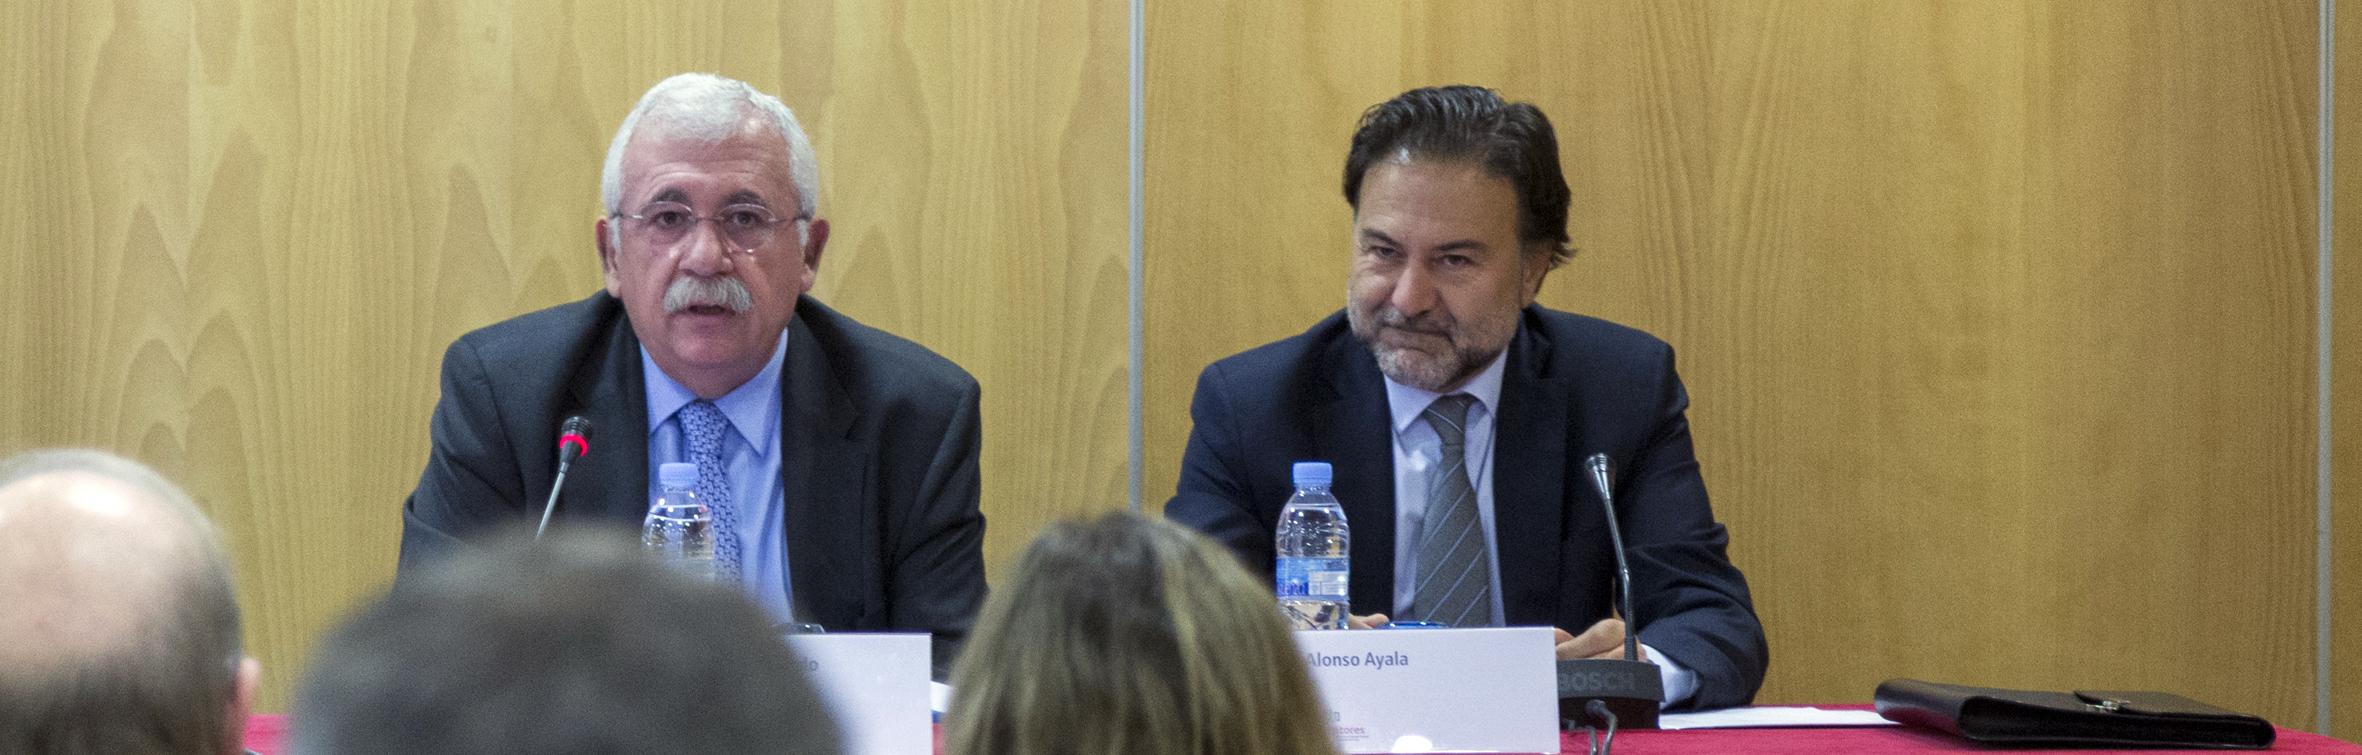 I Encuentro AEDAF - ICJCE